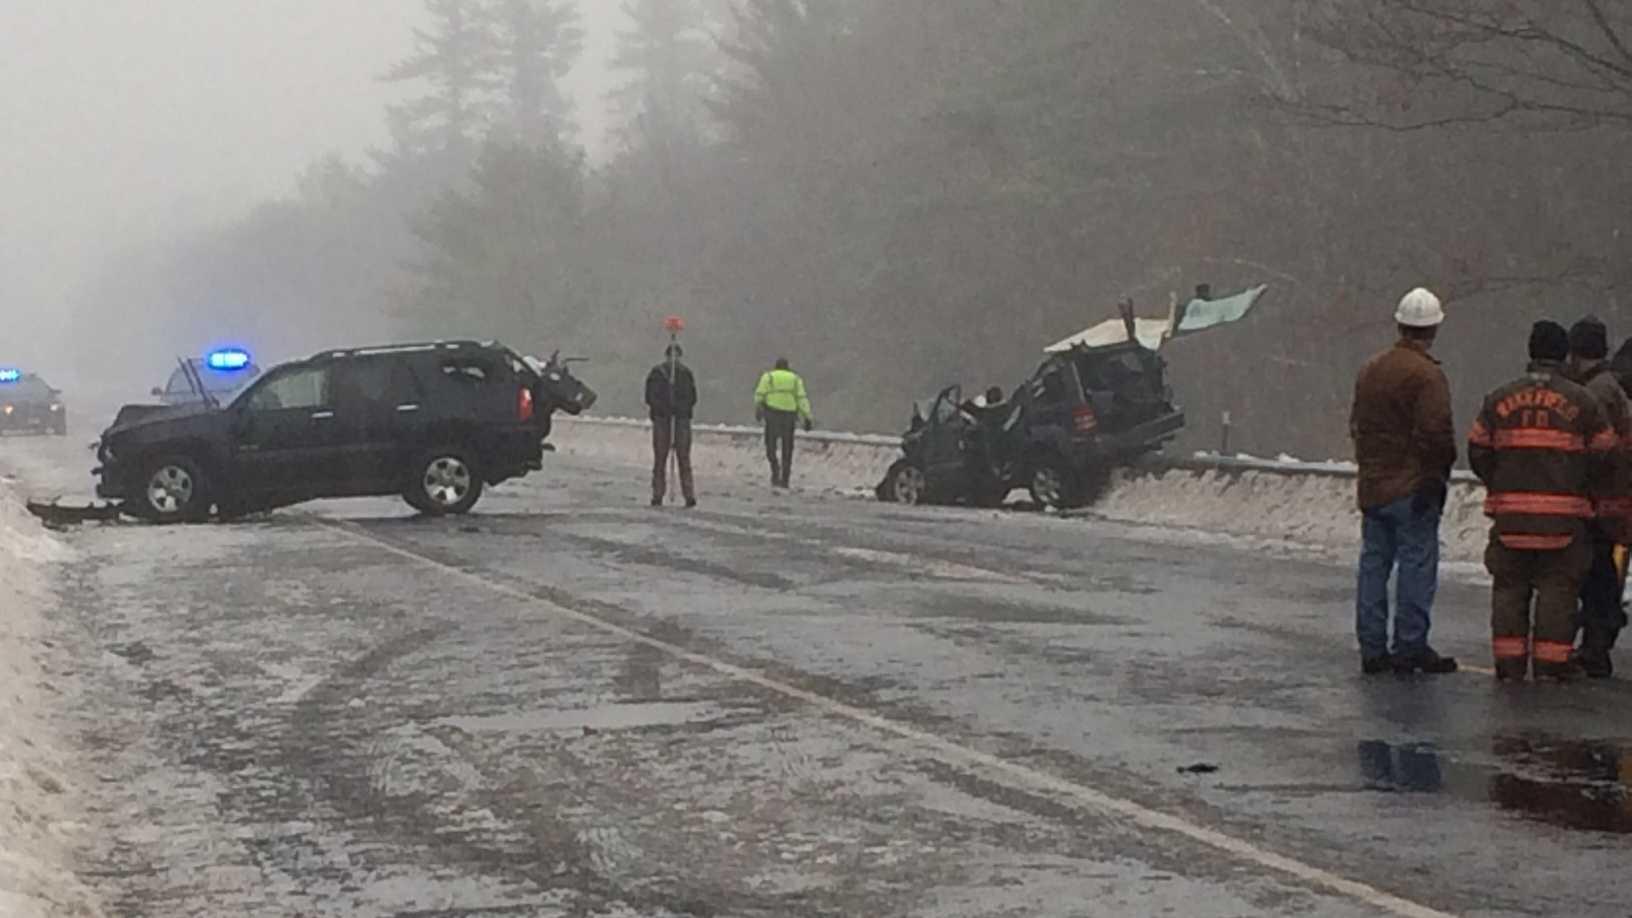 Serious crash on Rt. 16 in Milton